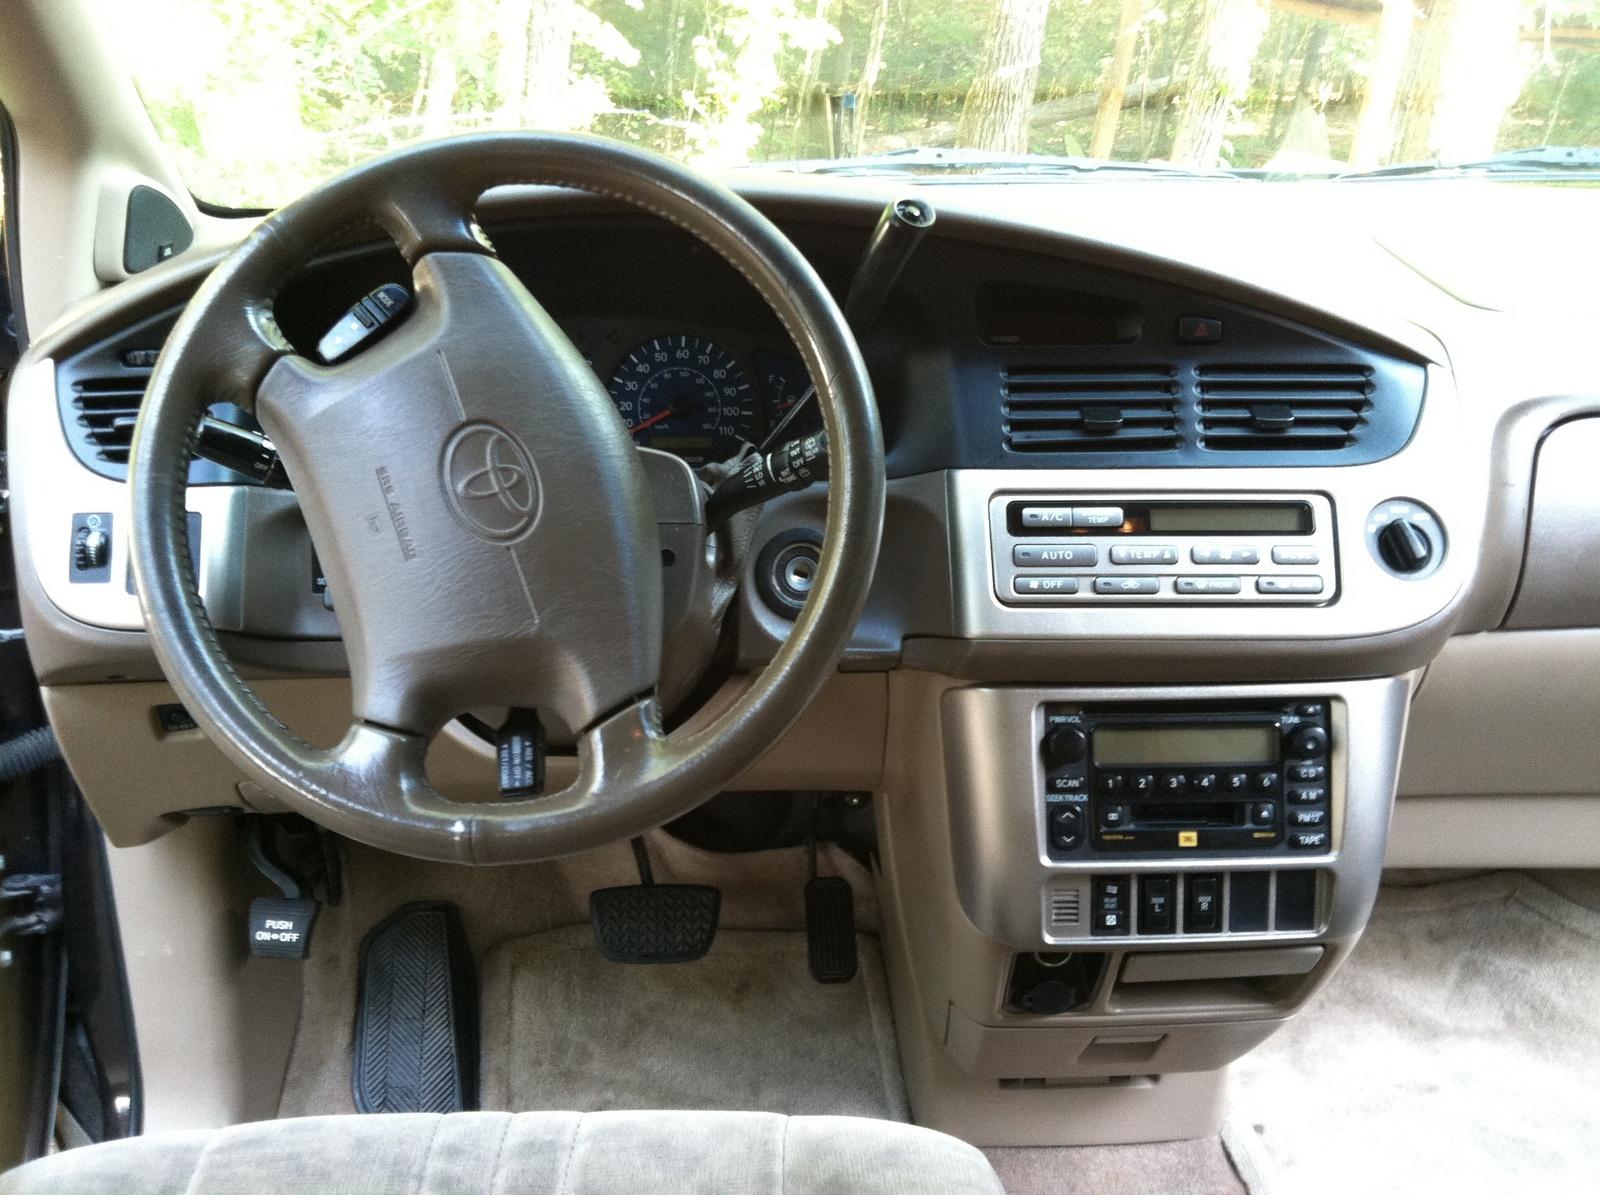 2003 Toyota Sienna Image 12